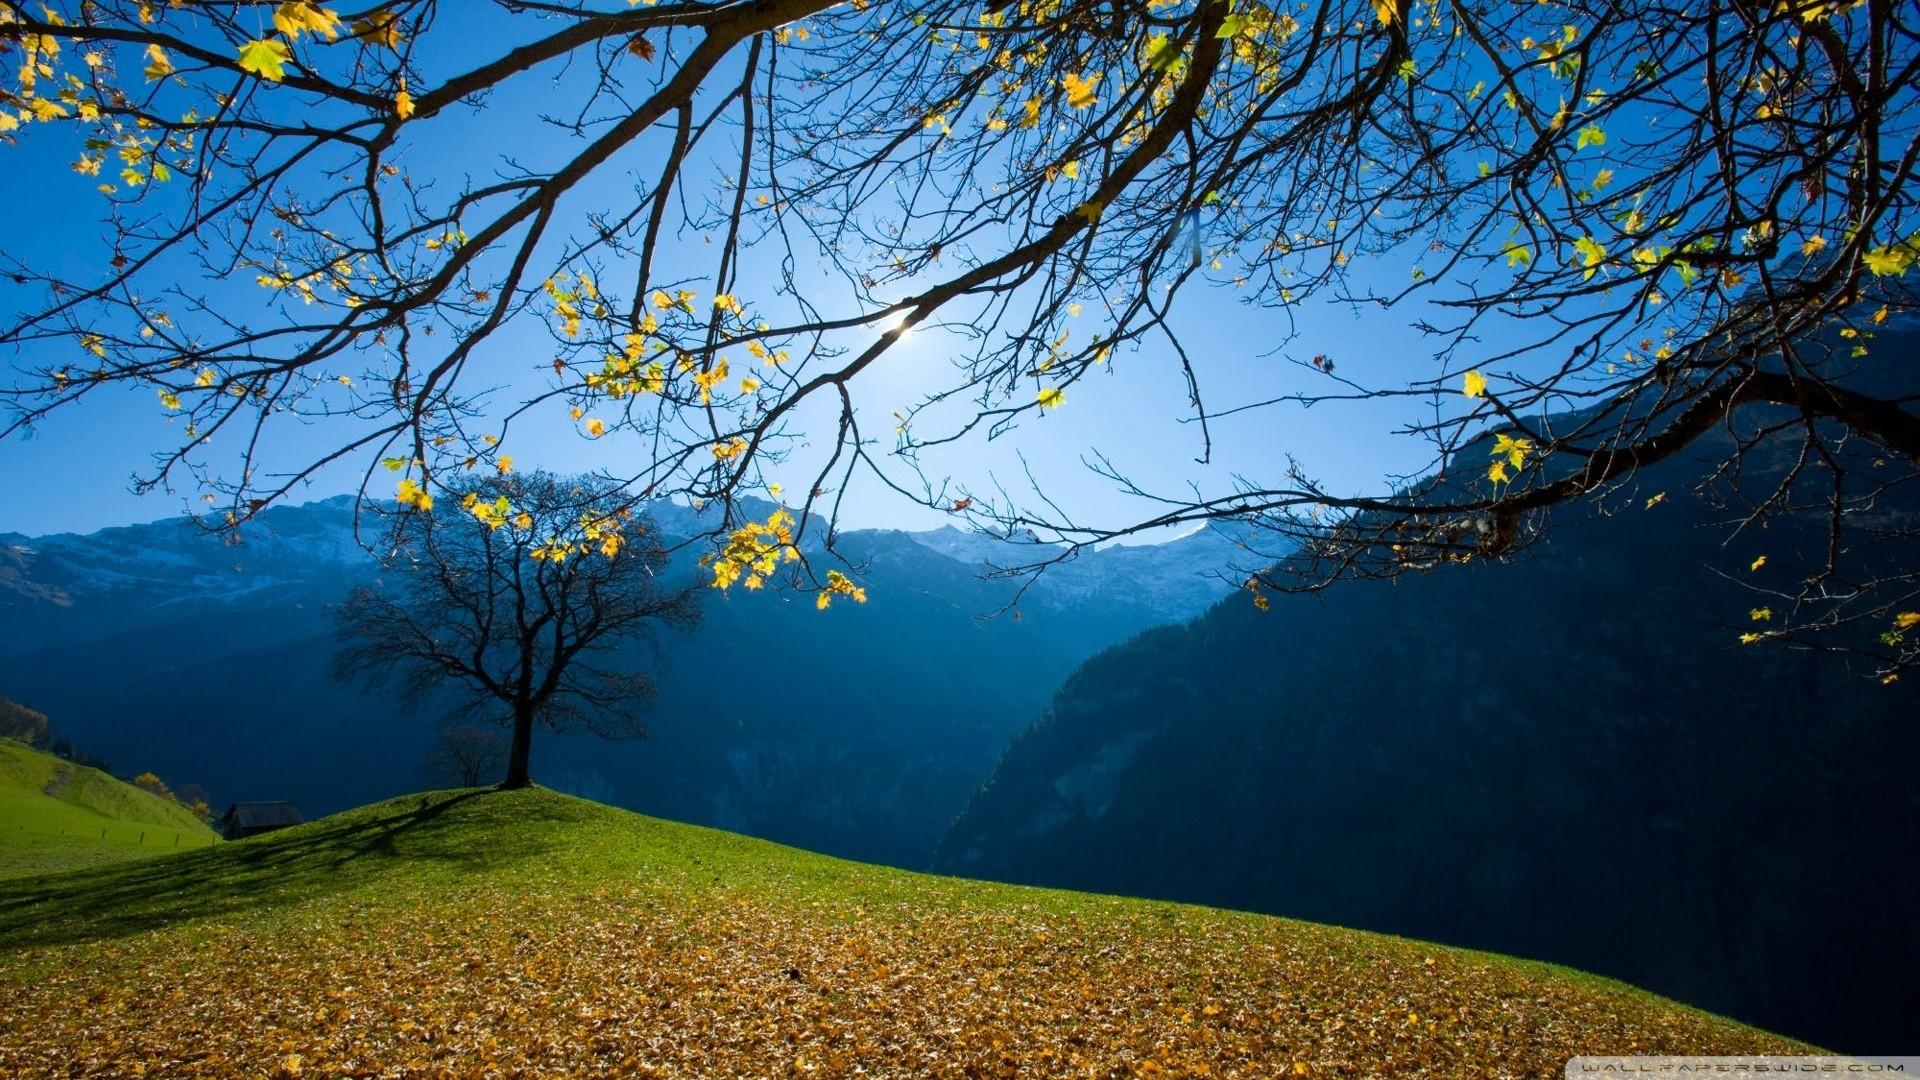 switzerland landscape wallpaper – Bing Images